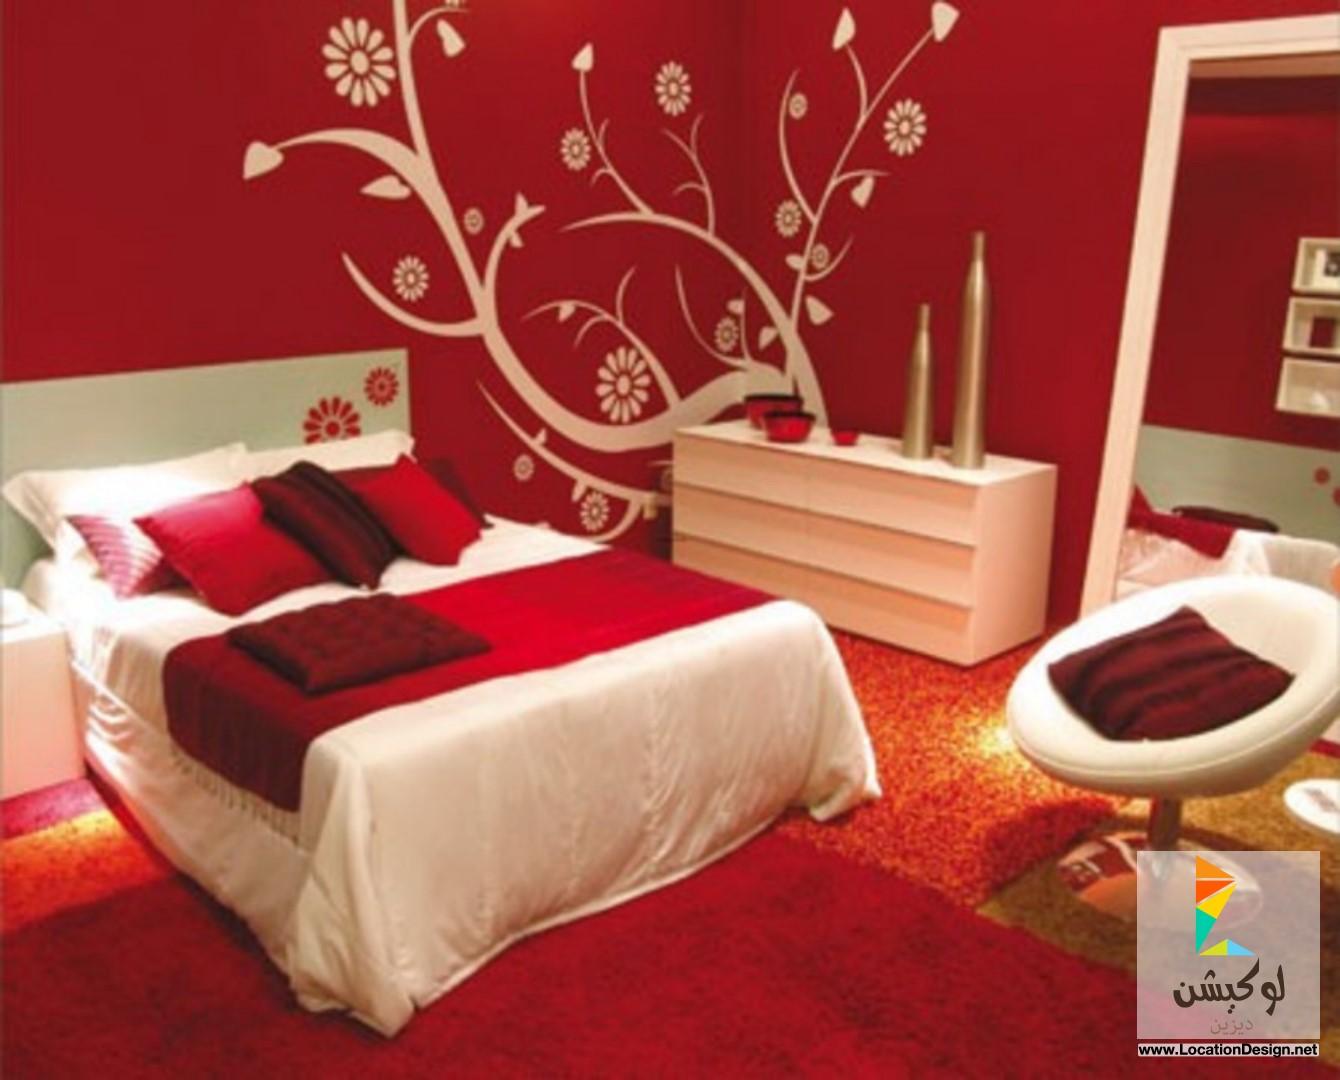 بالصور افكار لغرف نوم بنات , اجمل افكار لغرف النوم بنات 11762 7